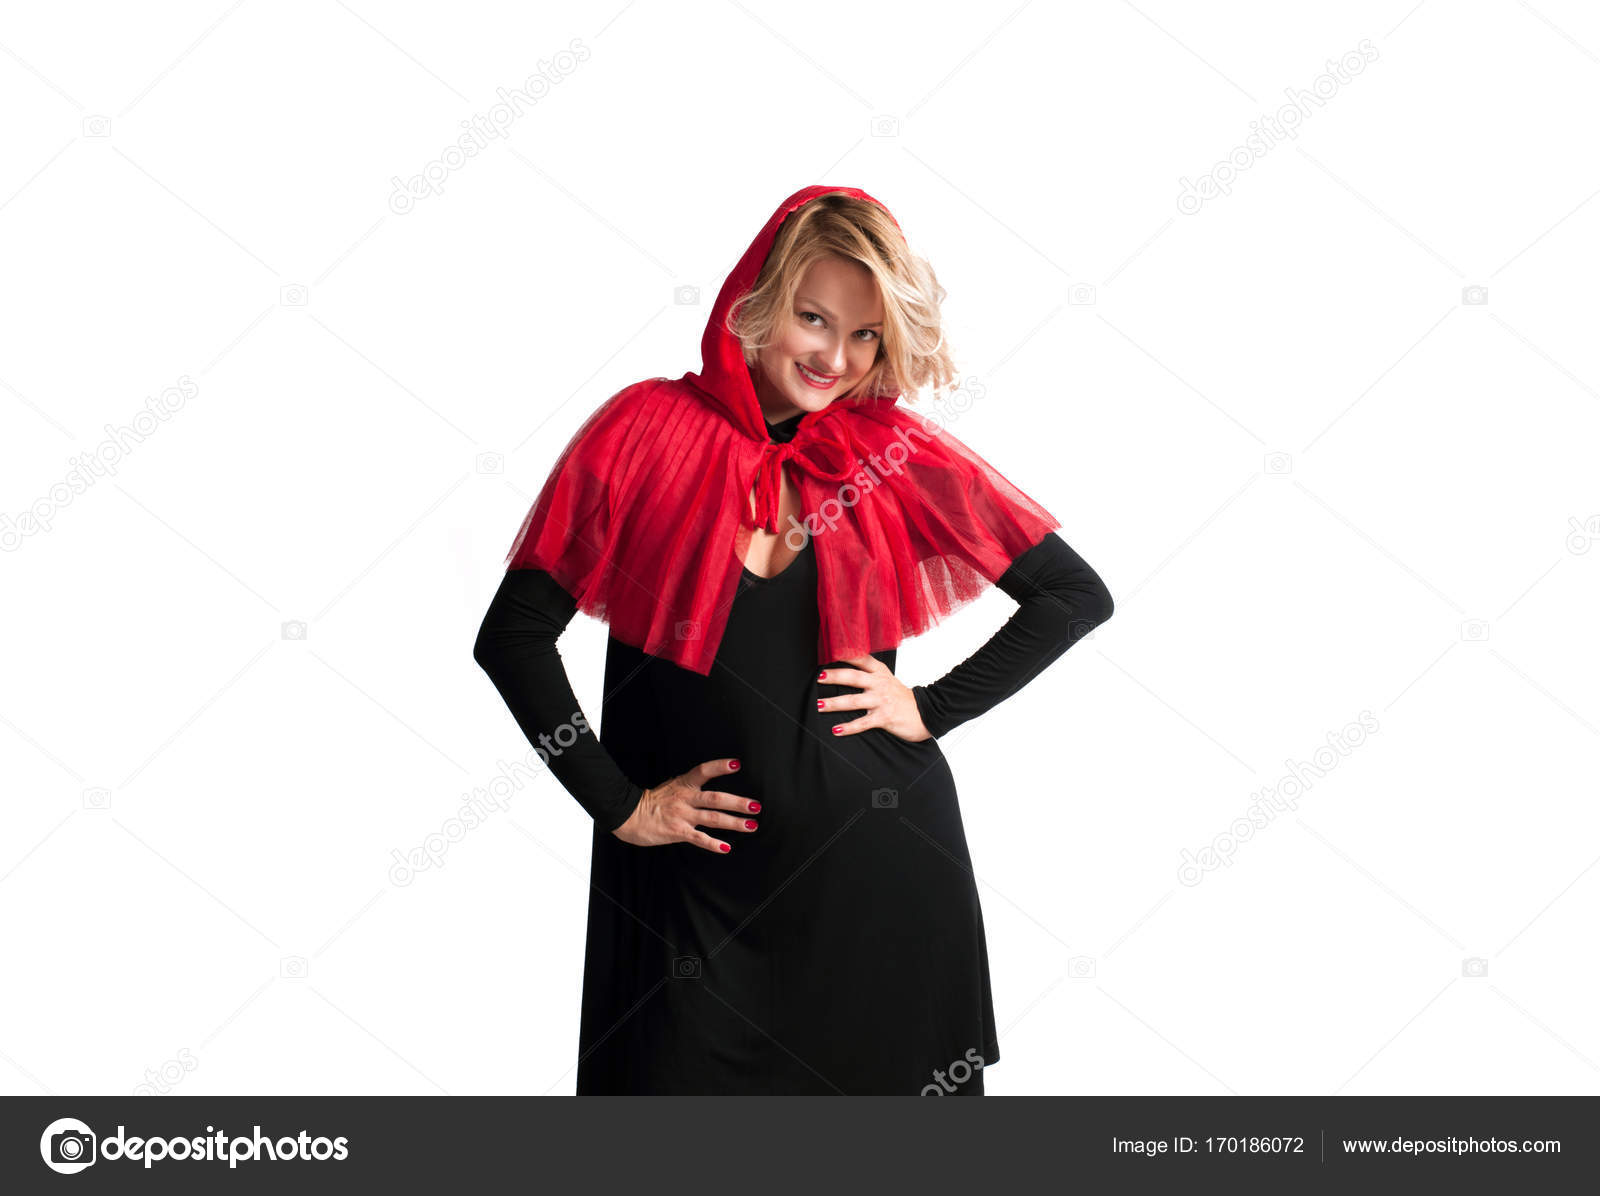 Caperucita Roja Halloween.Imagenes Caperucita Roja Sensual Hermosa Mujer En Traje